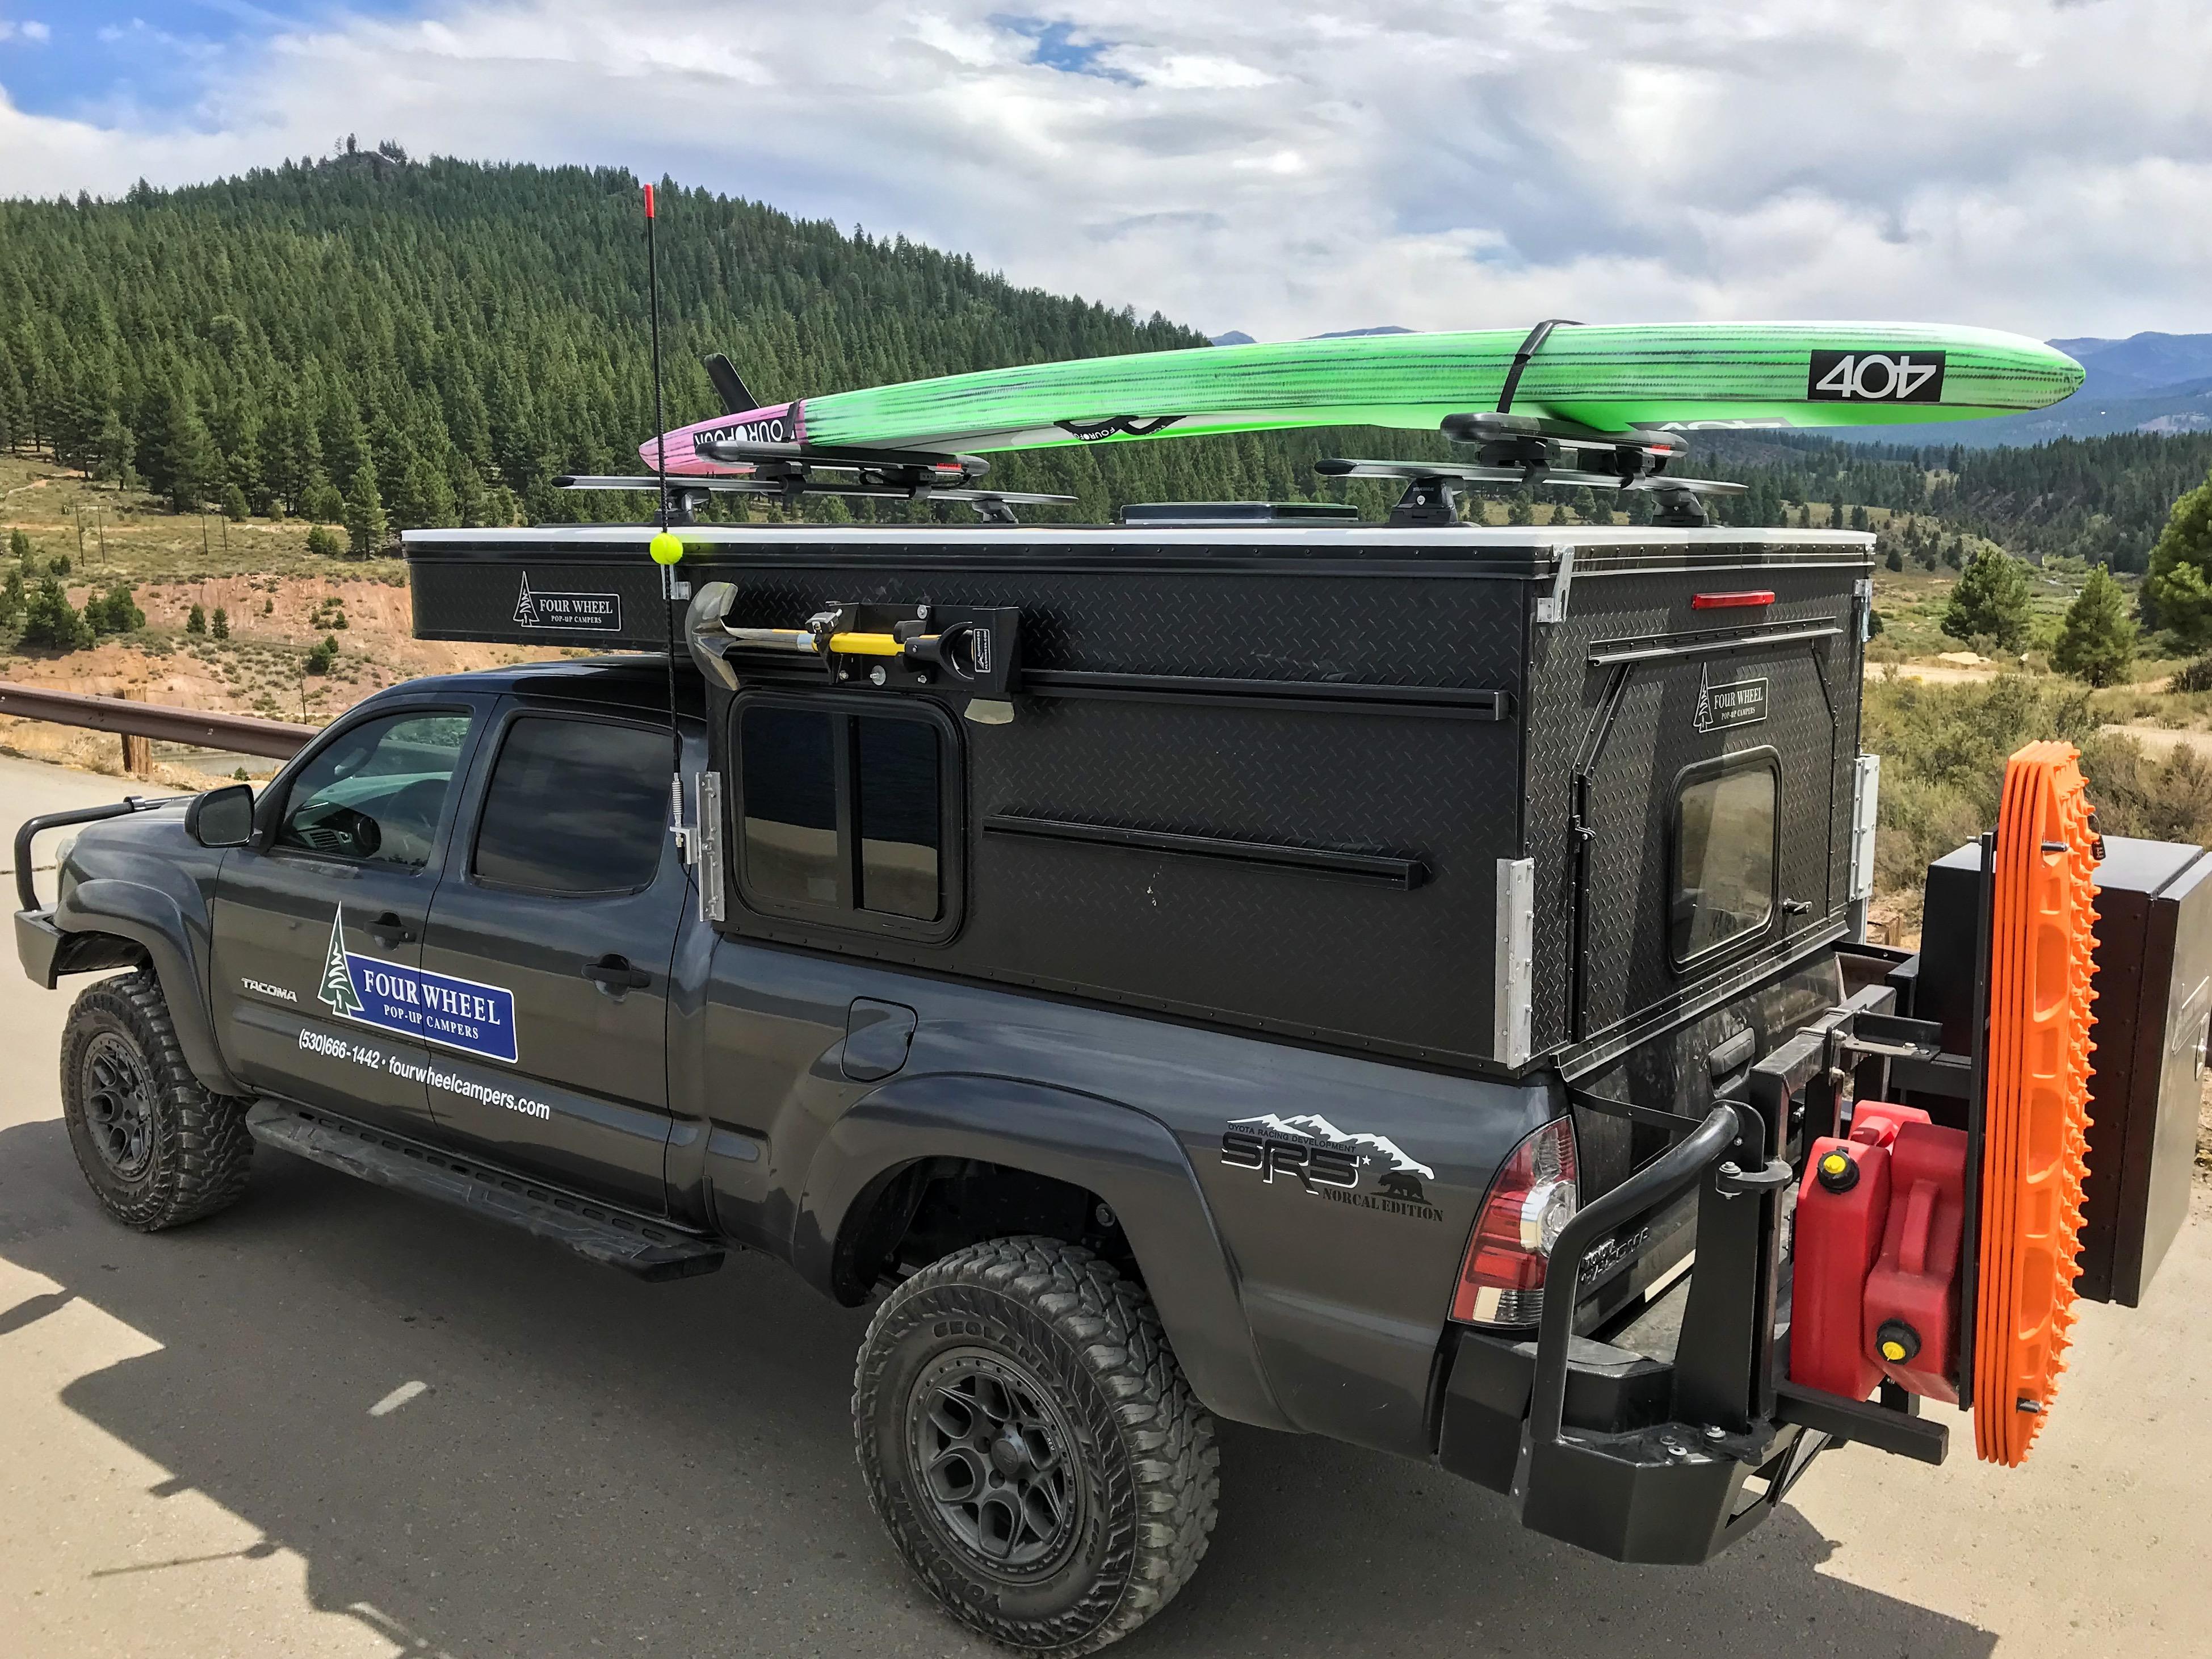 Four Wheel Campers Reveals Lightweight Pop Top Truck Camper